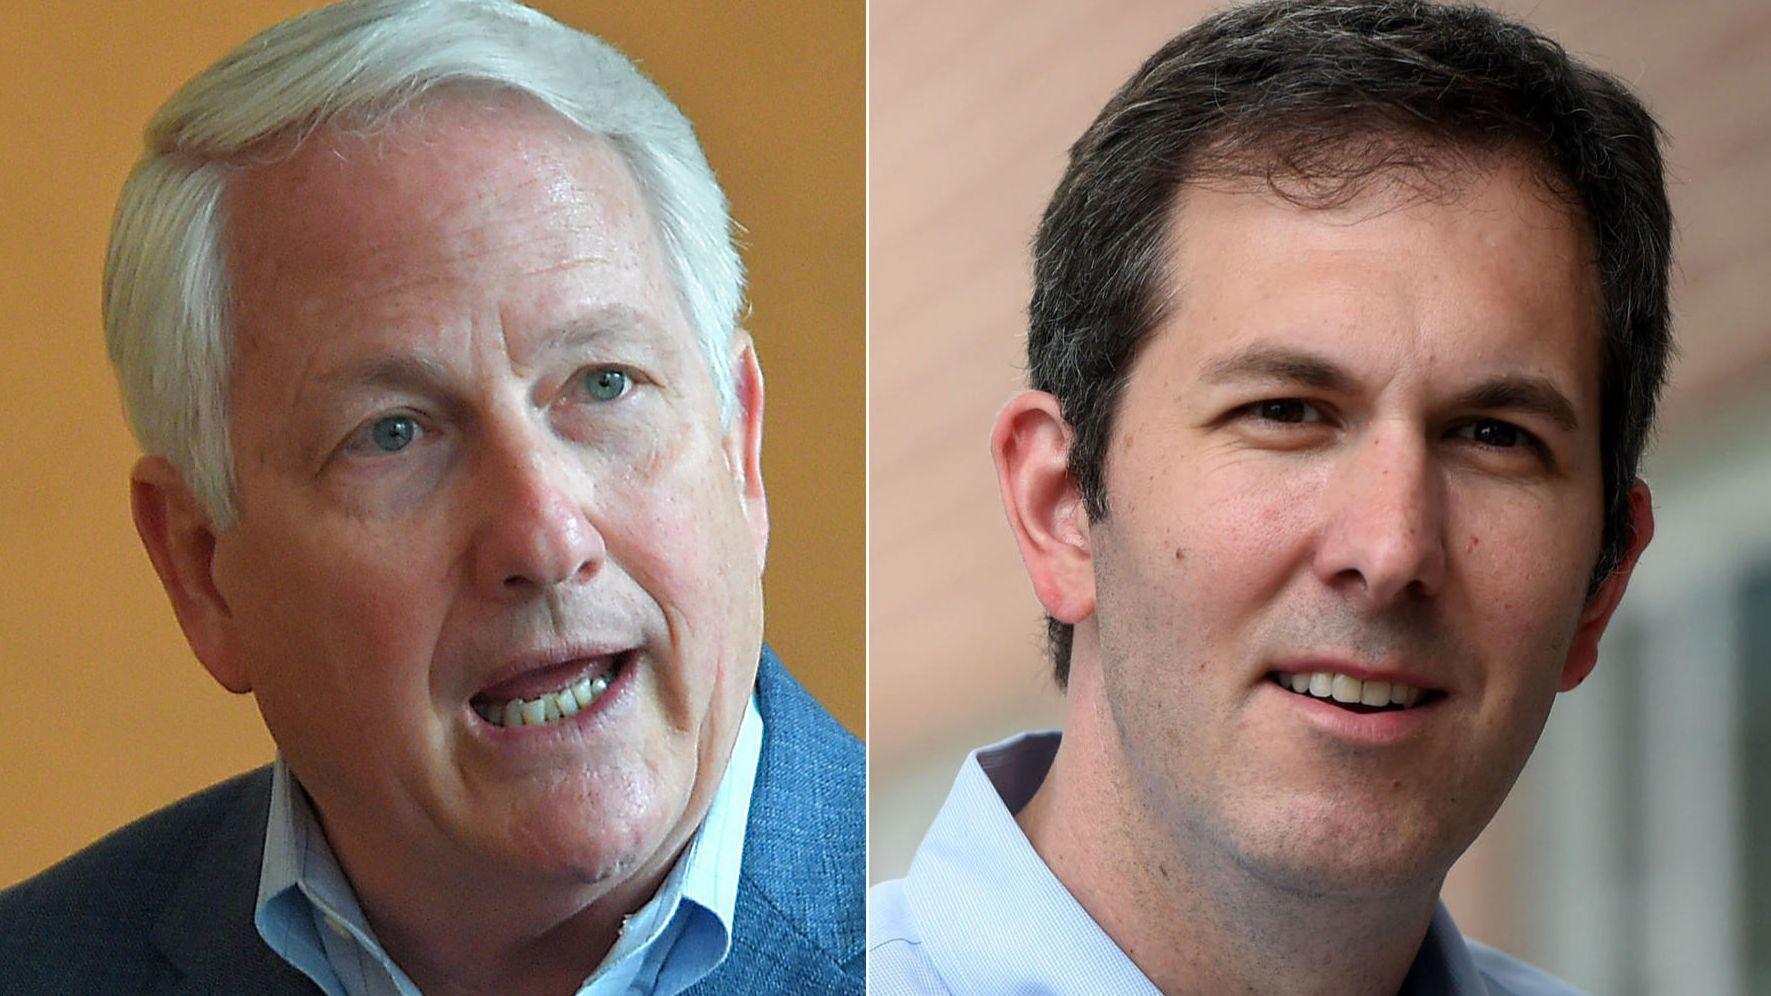 Air campaign: Baltimore County executive candidates Olszewski, Redmer to face in radio debates | Baltimore Sun